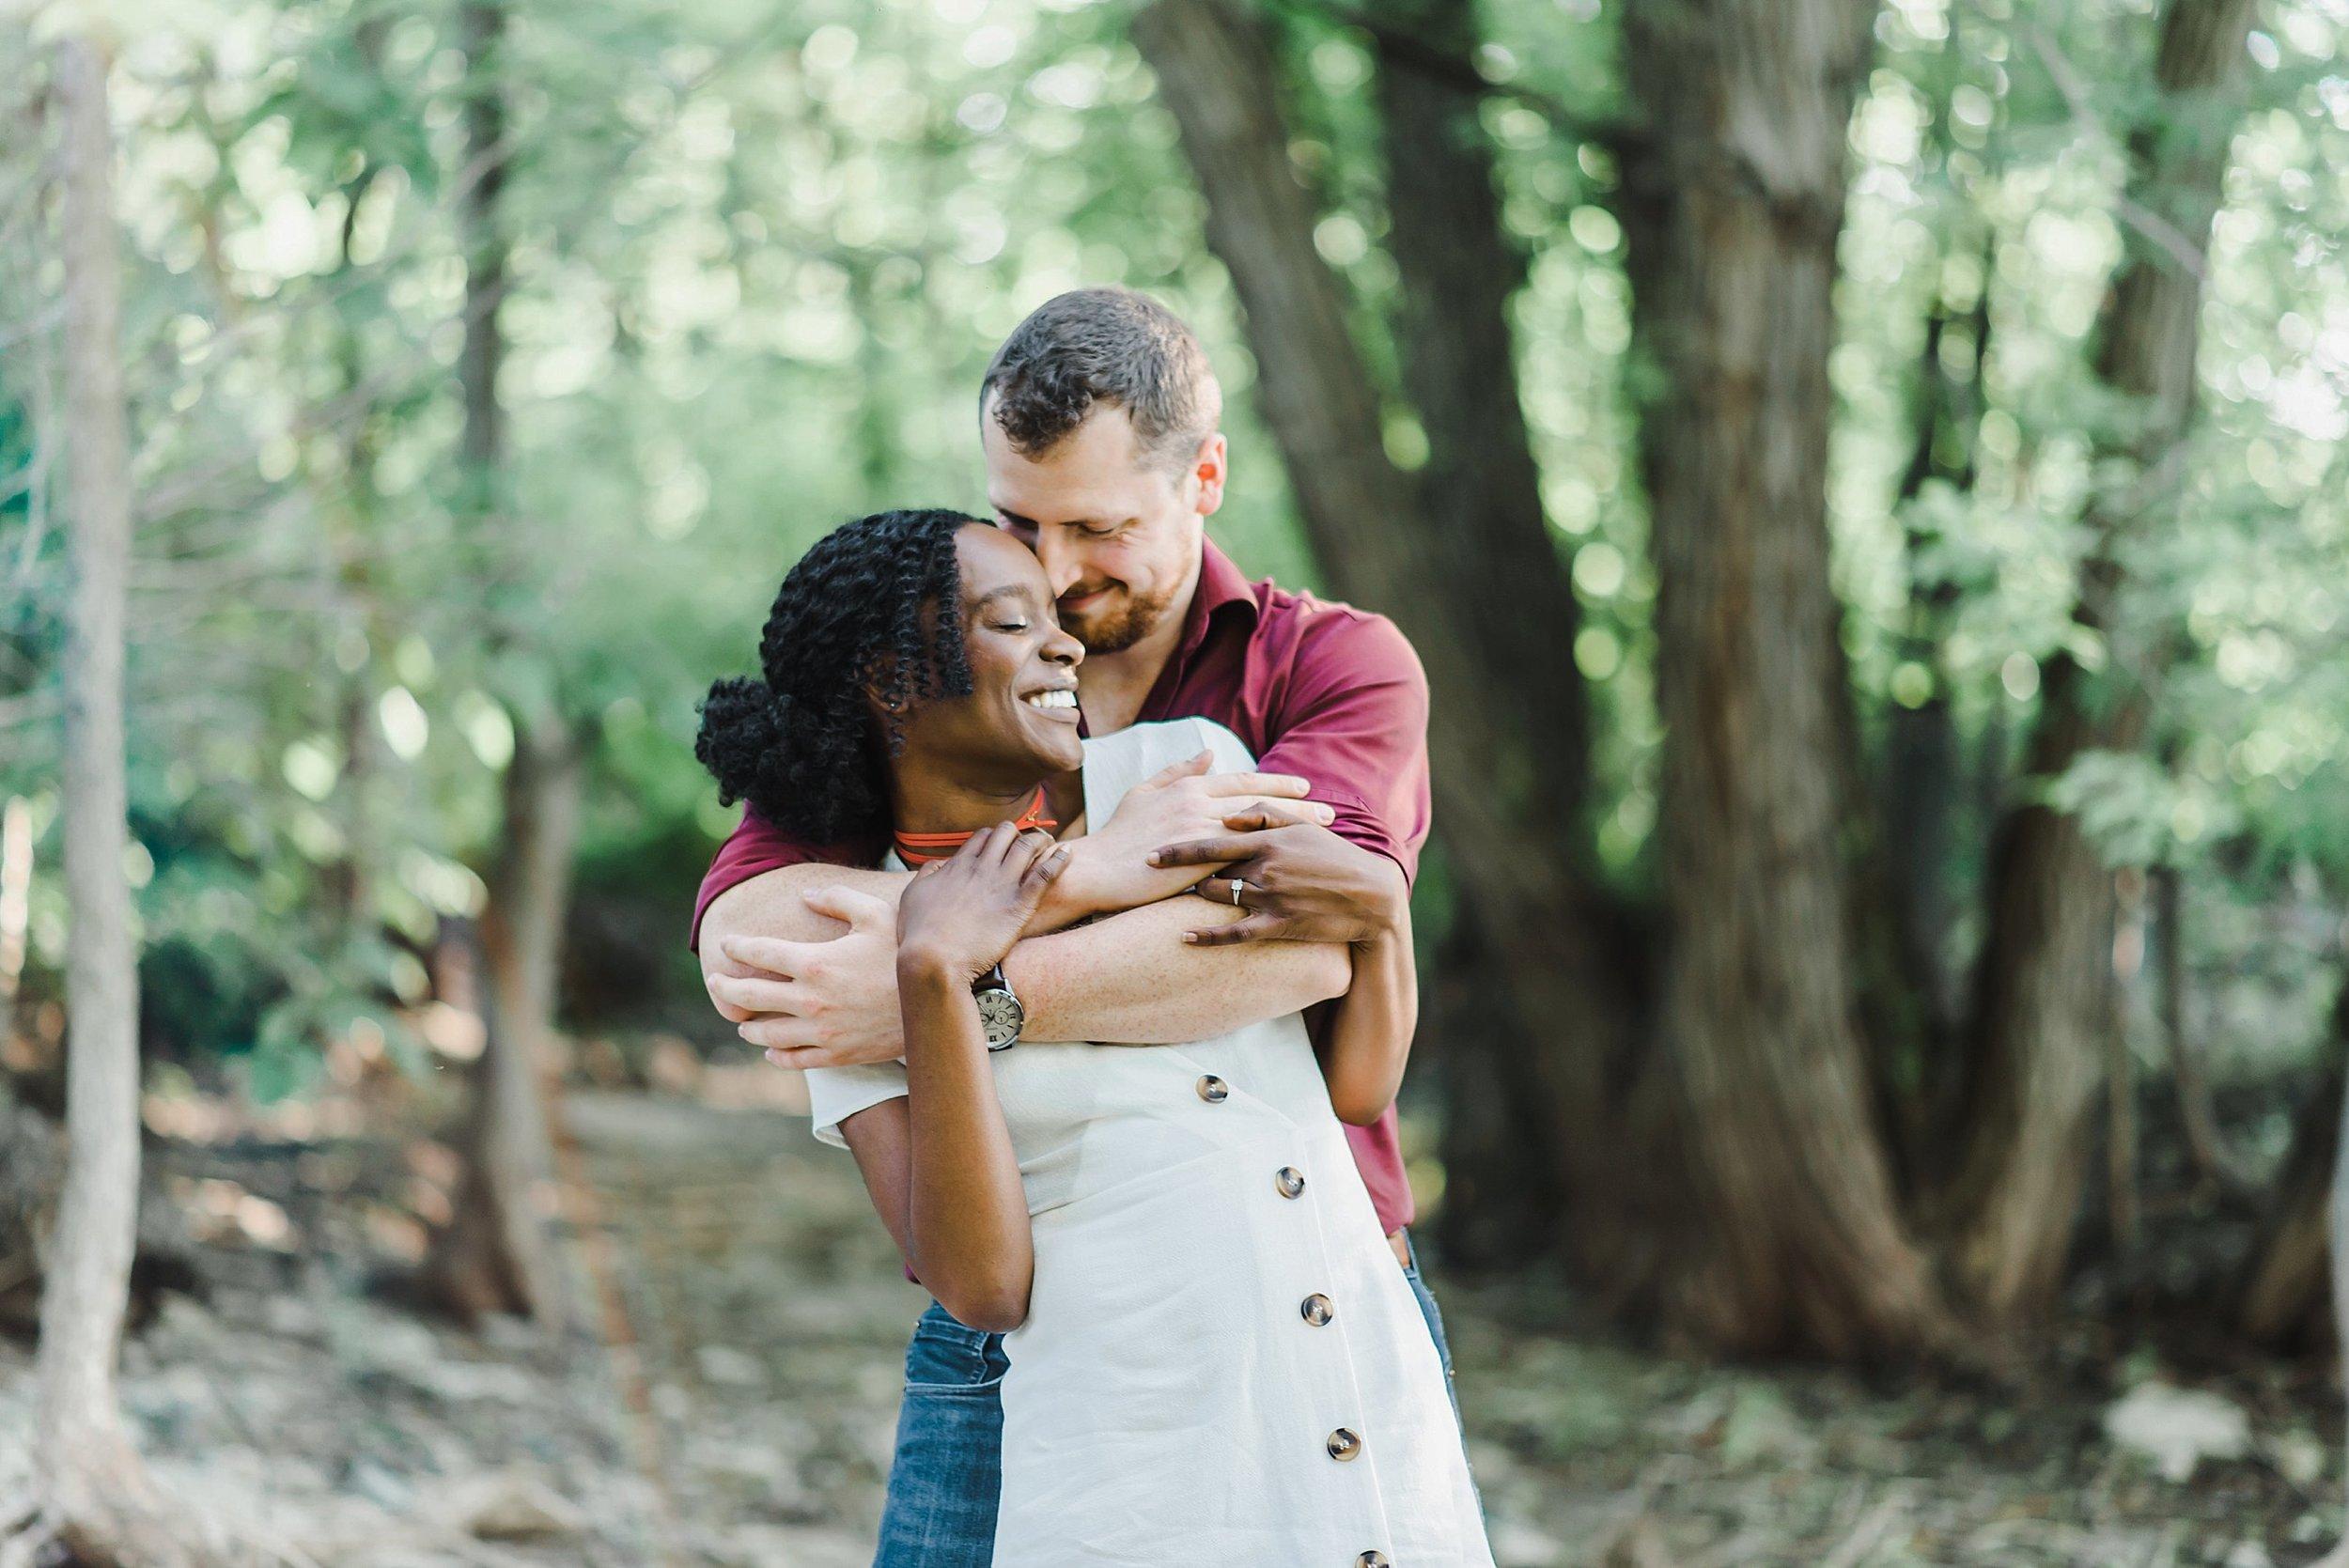 light airy indie fine art ottawa wedding photographer | Ali and Batoul Photography_0158.jpg